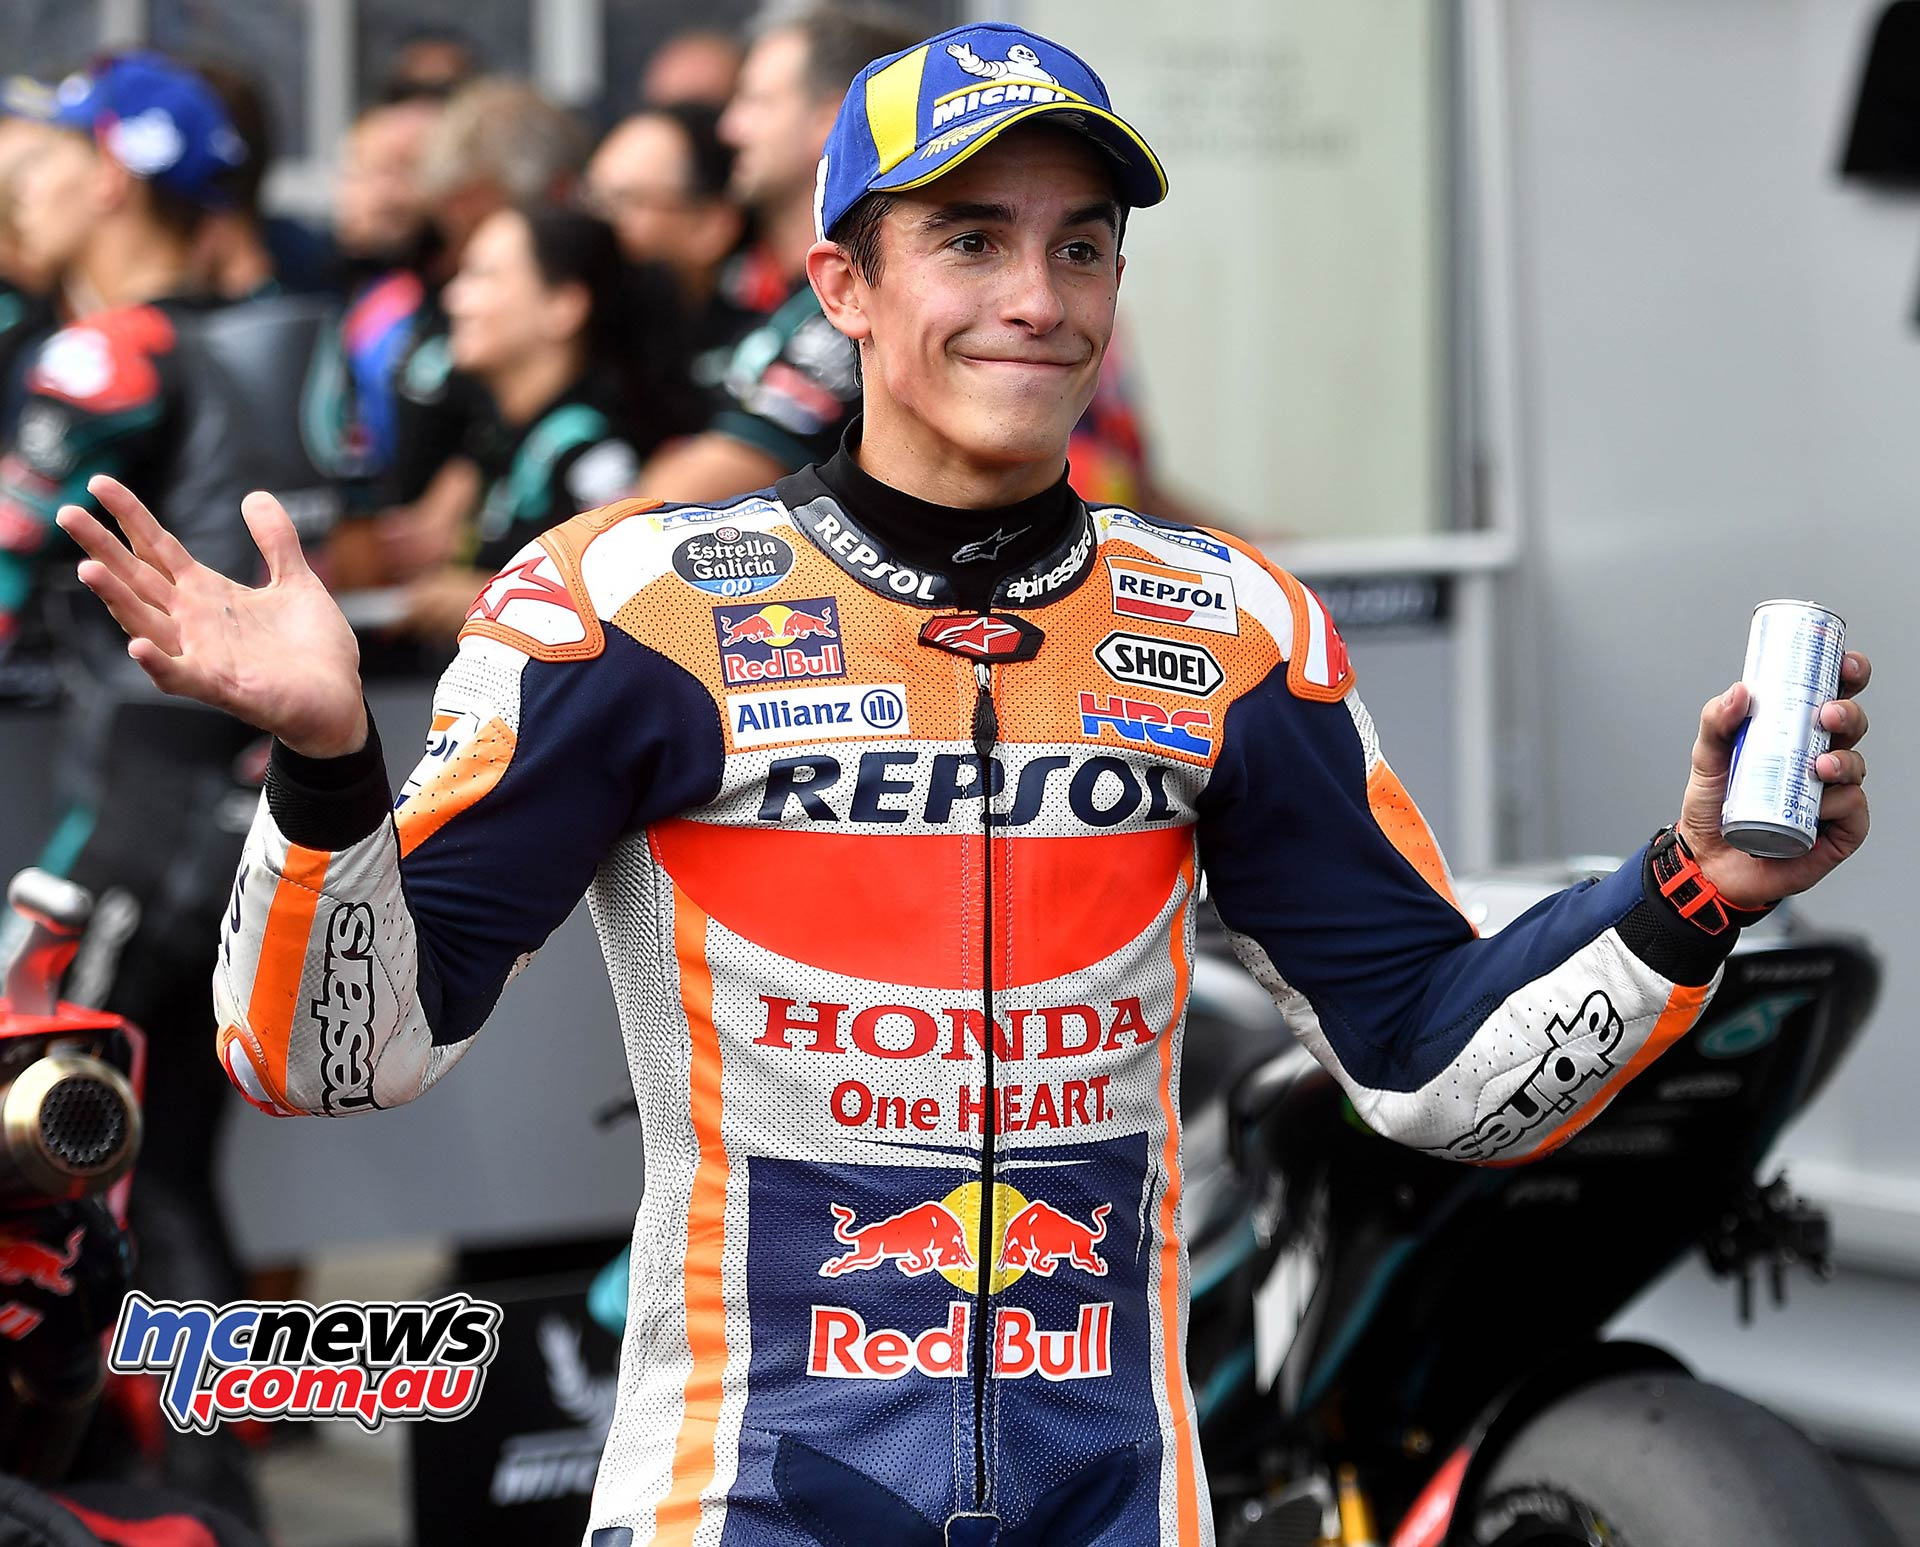 MotoGP Rnd RedBullRing Race Marquez ParcFerme